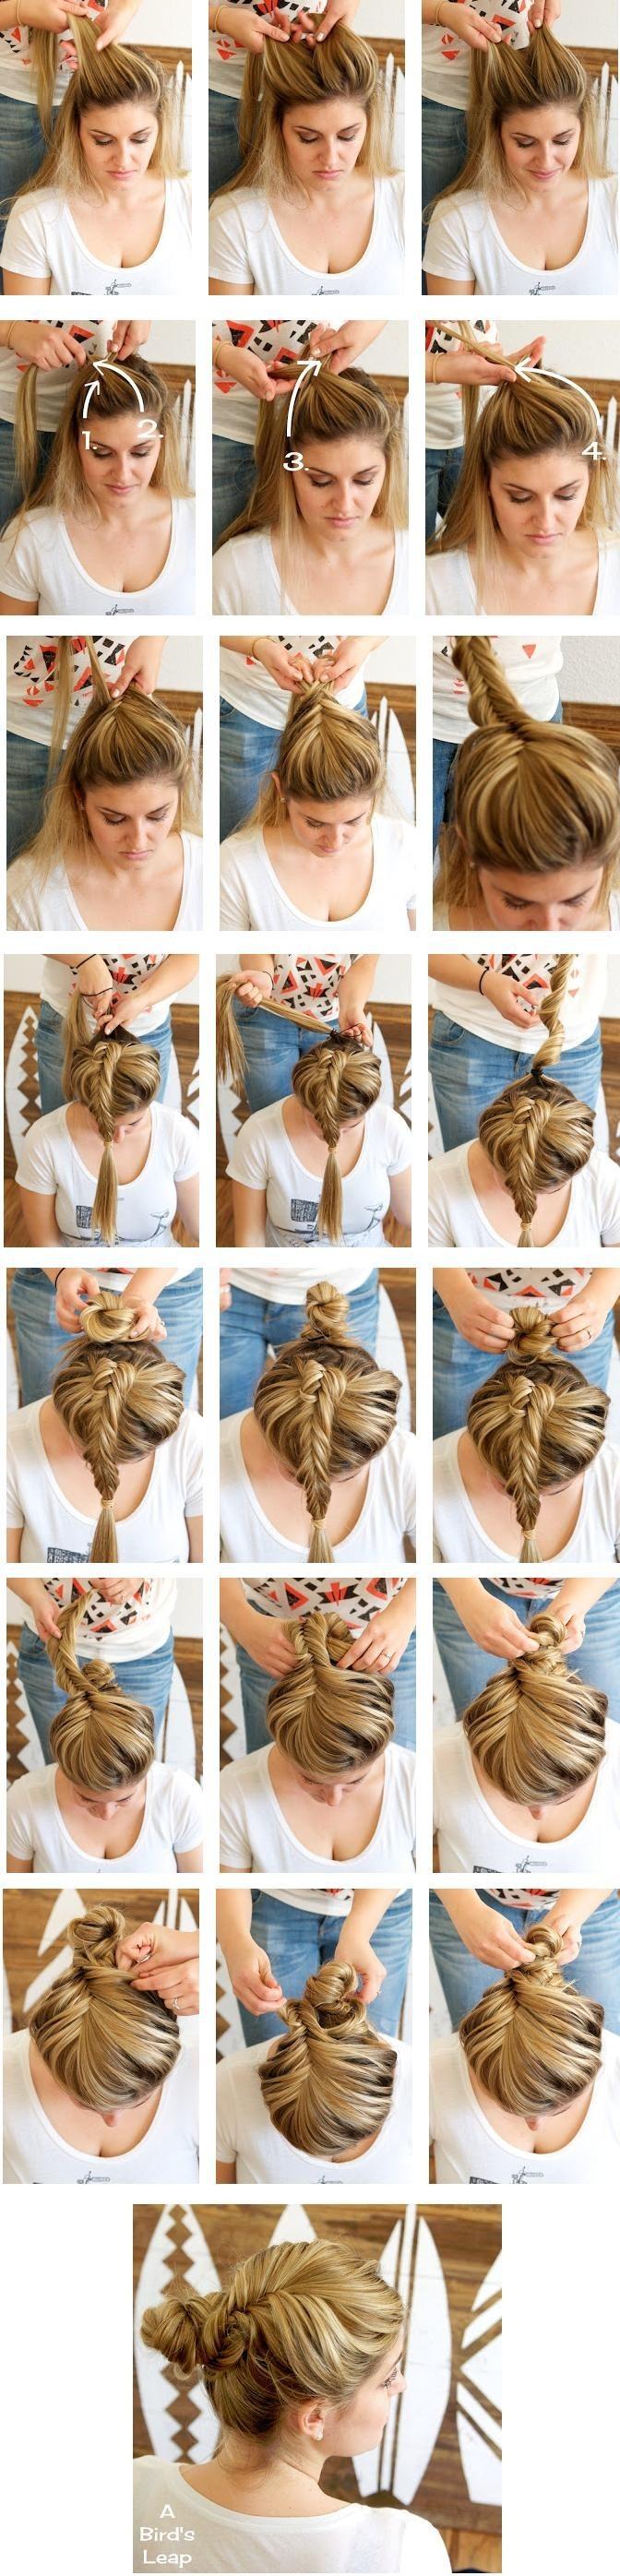 Fishtail Braided Bun Hairstyles Tutorial: Girl Hairstyles for Long Hair